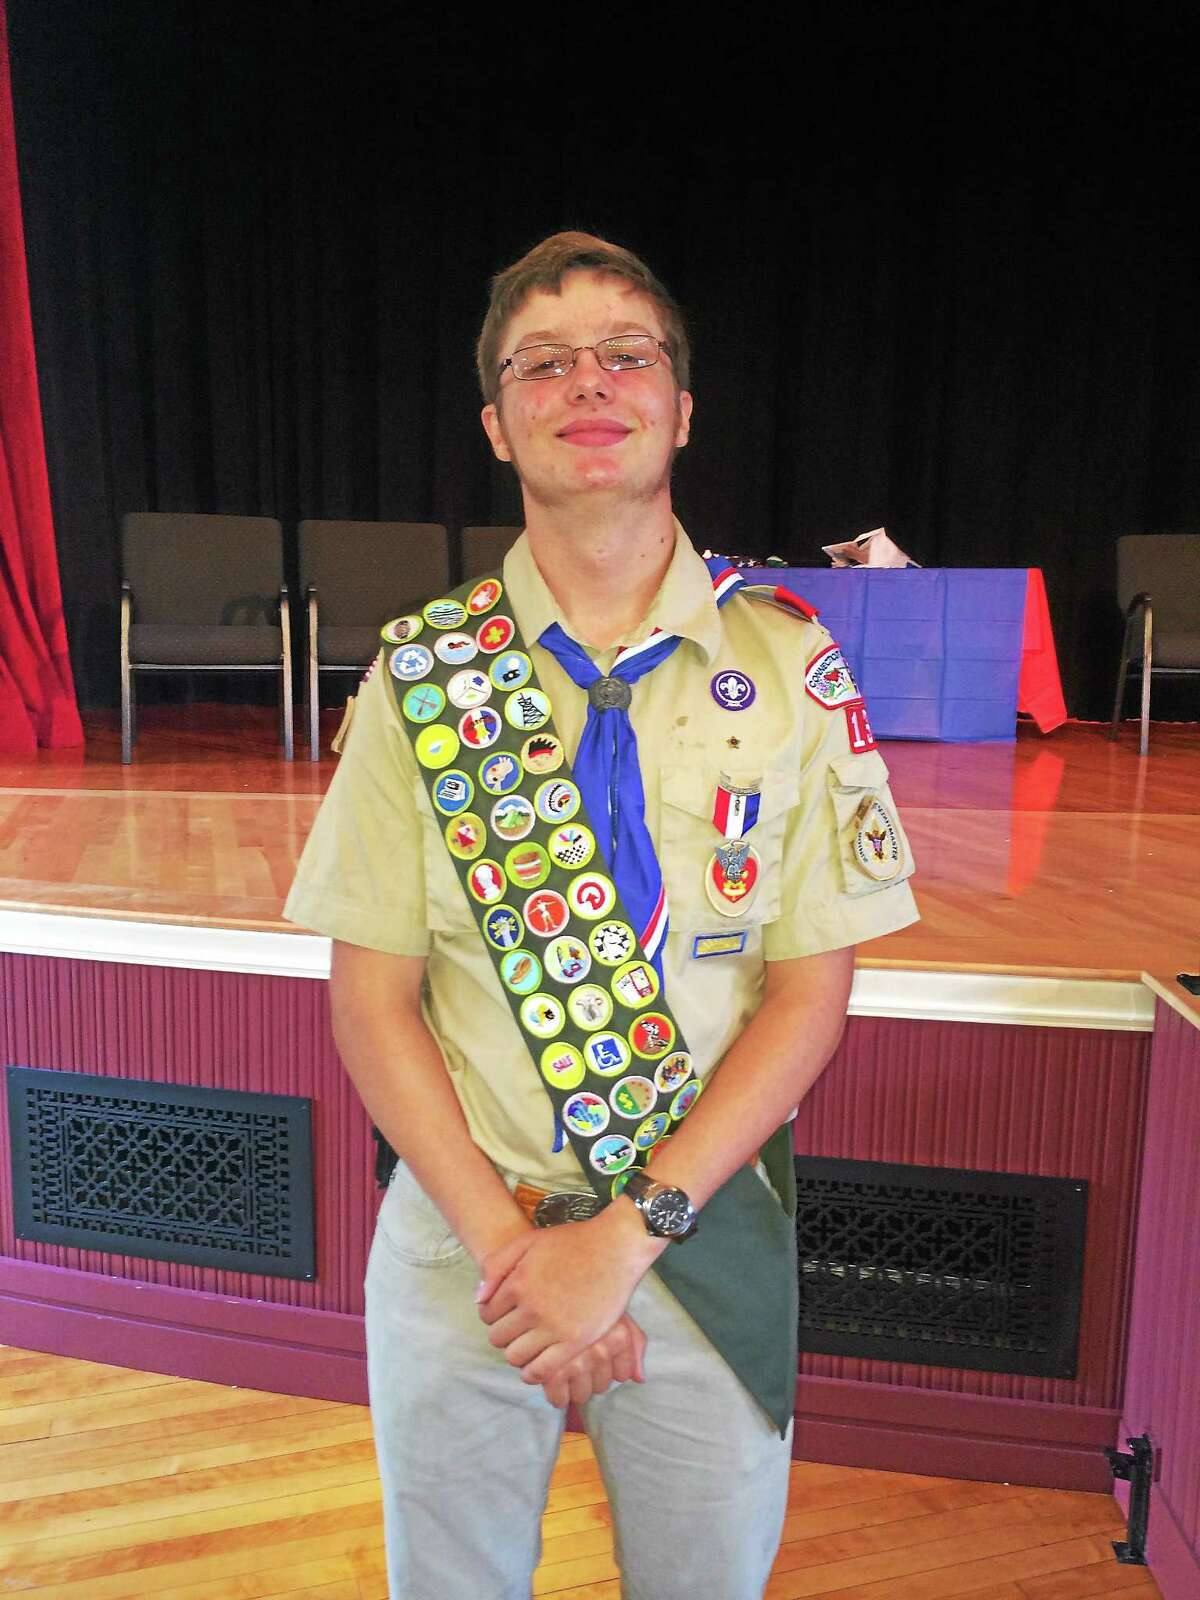 Chester/Deep River Boy Scout Troop 13's newest Eagle Scout is Josef Fenton Lenz